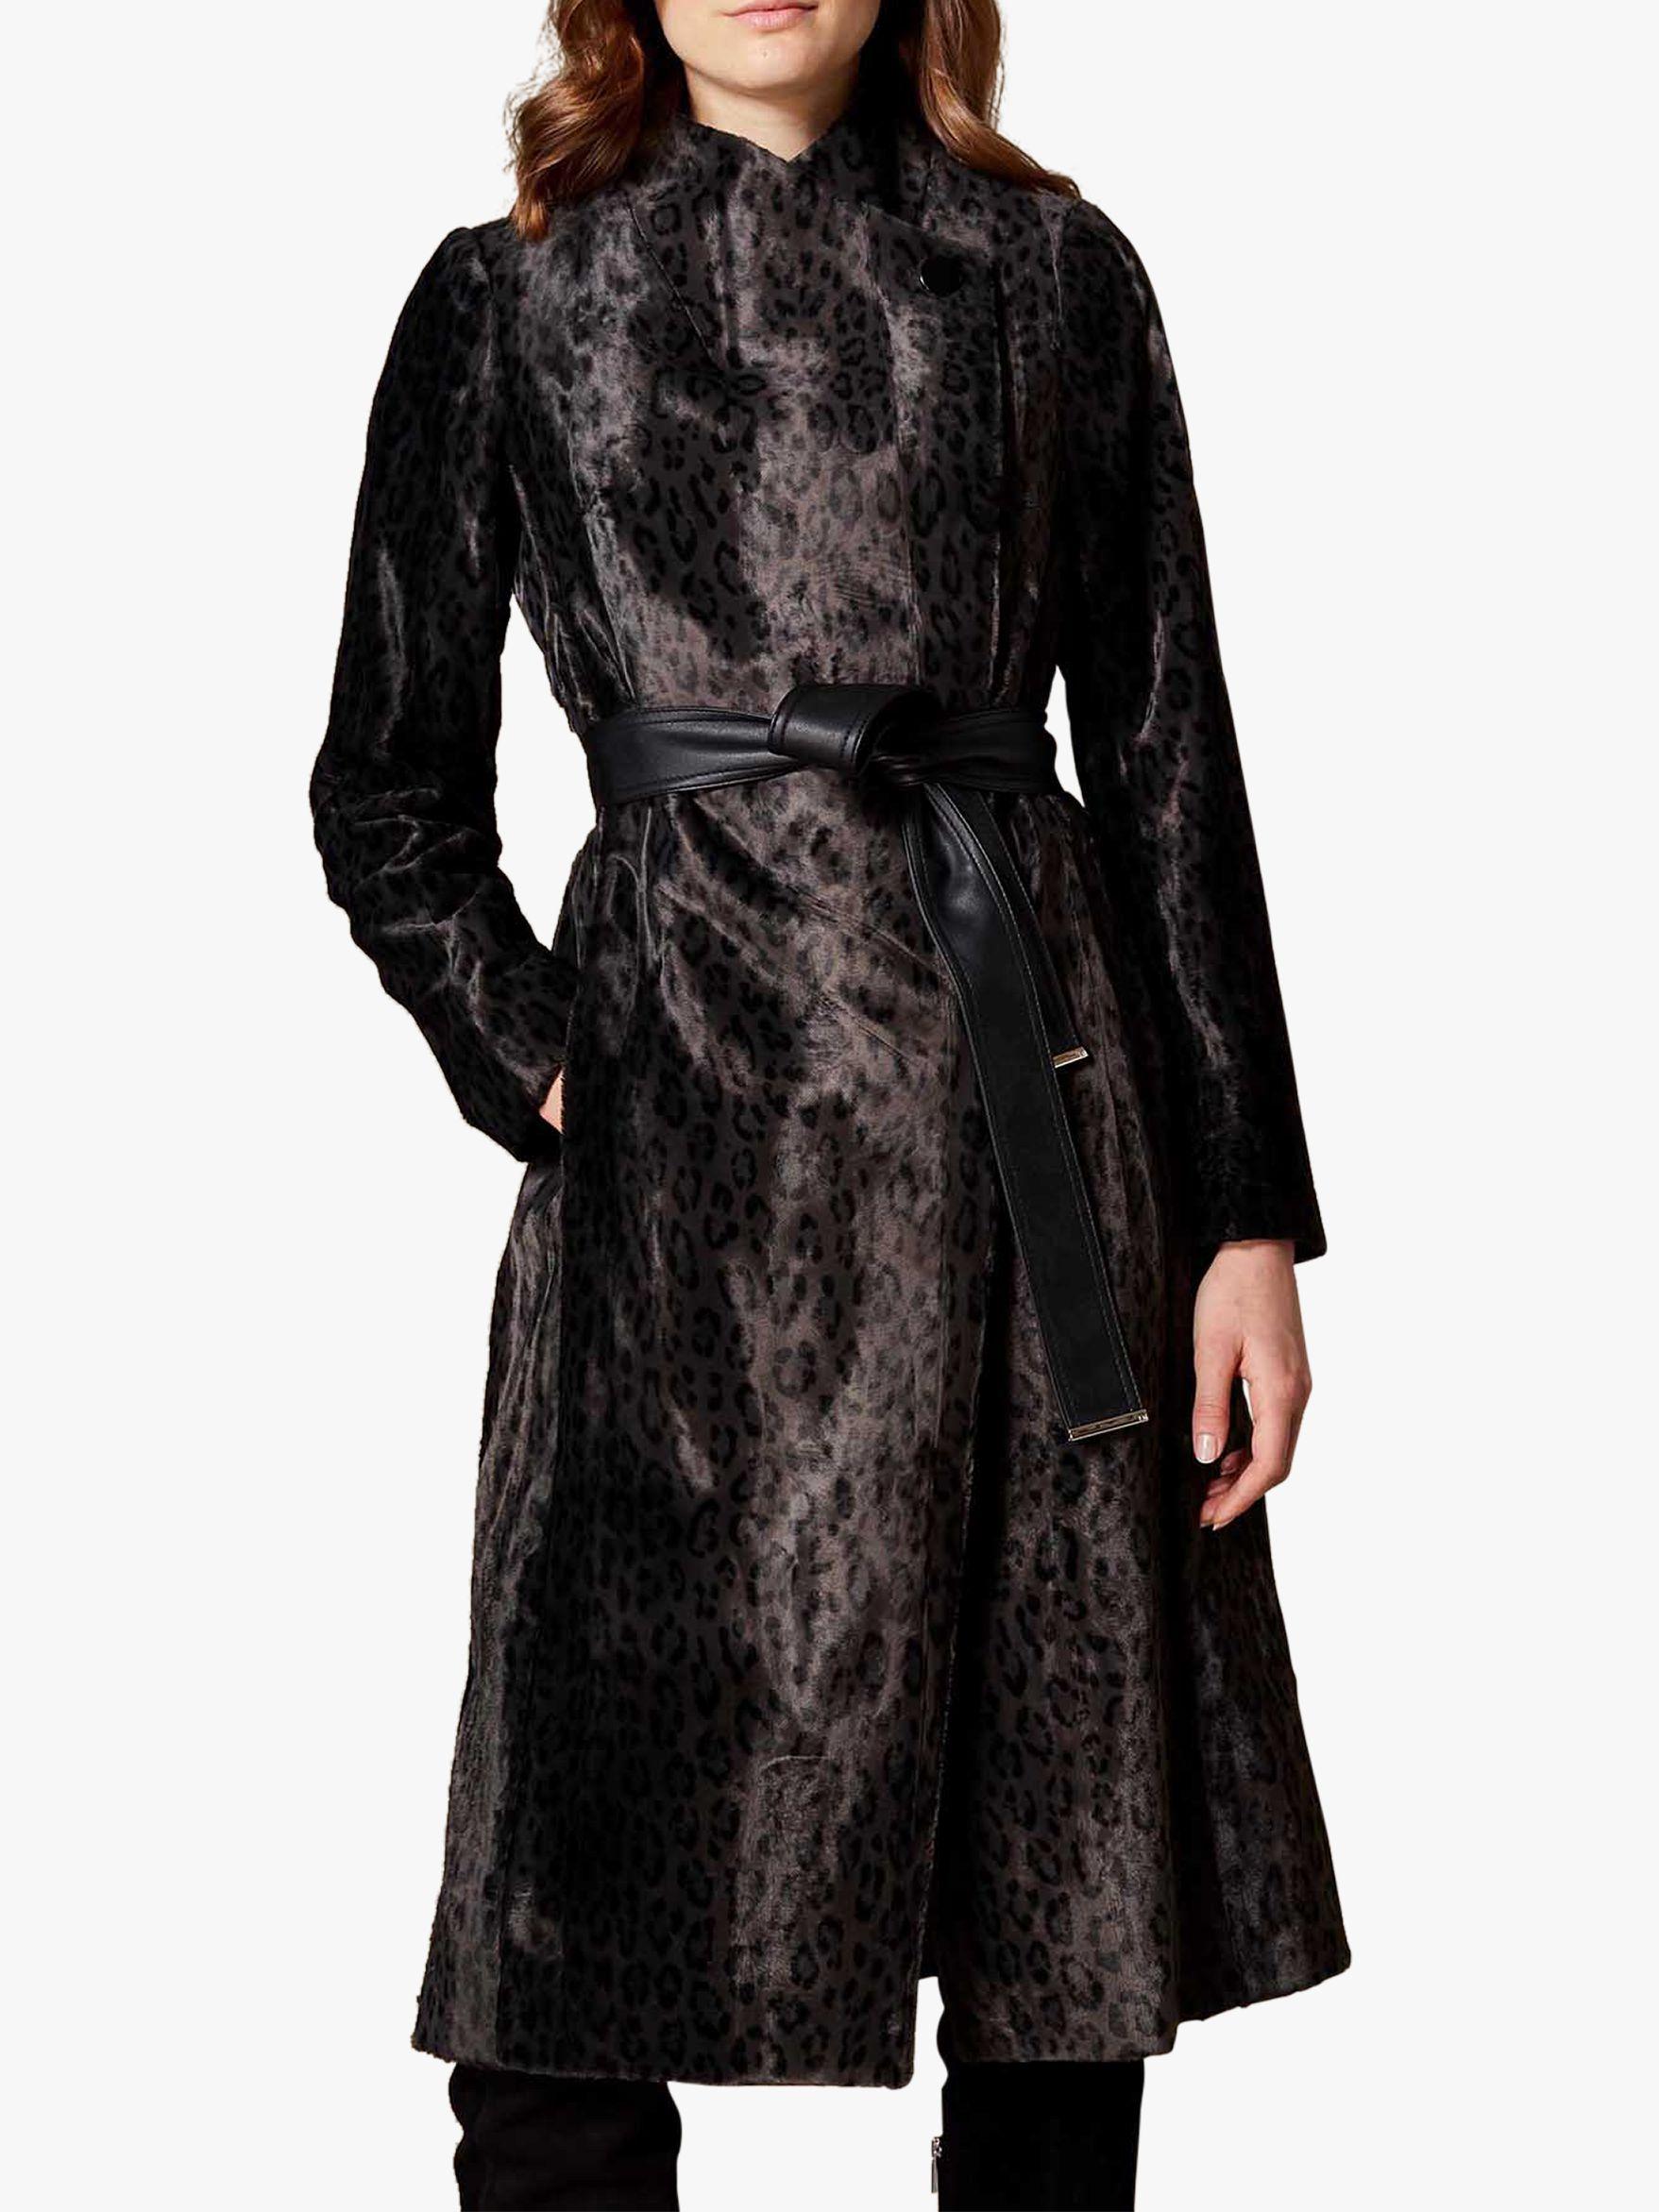 74546df1a597 Karen Millen Leopard Print Wrap Coat, Black at John Lewis & Partners